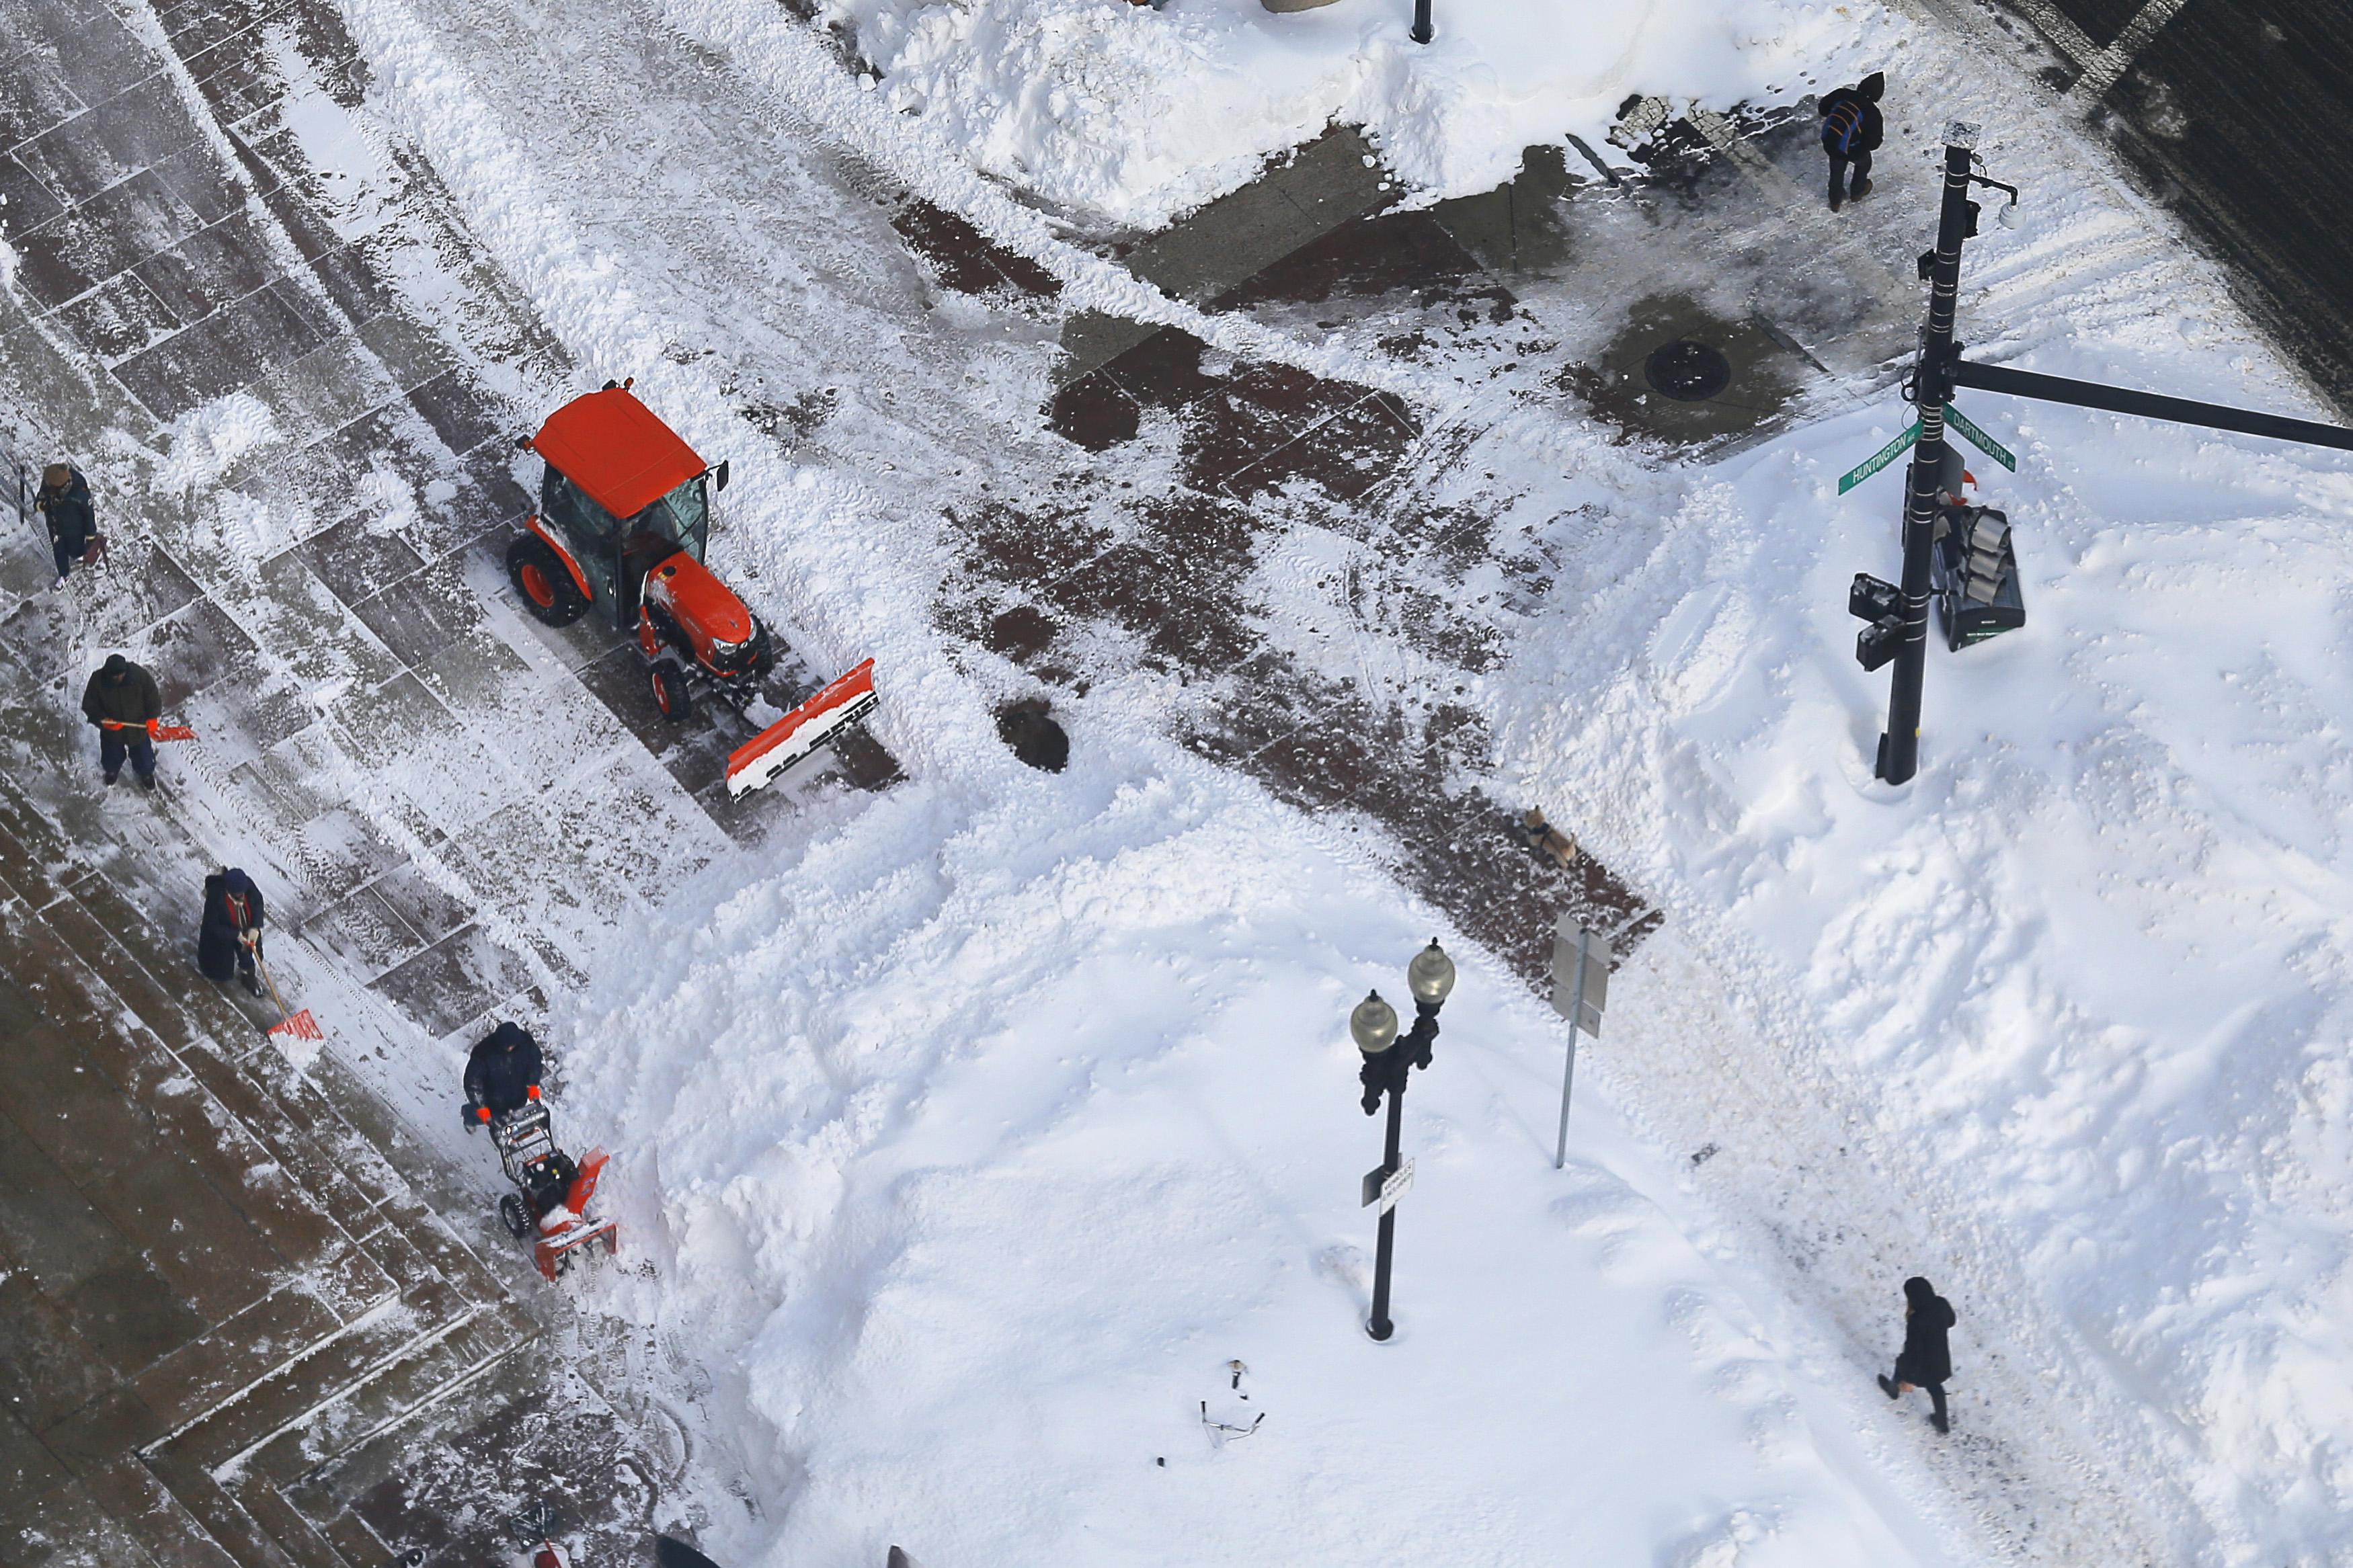 Crews work to clear sidewalks following a winter blizzard in Boston